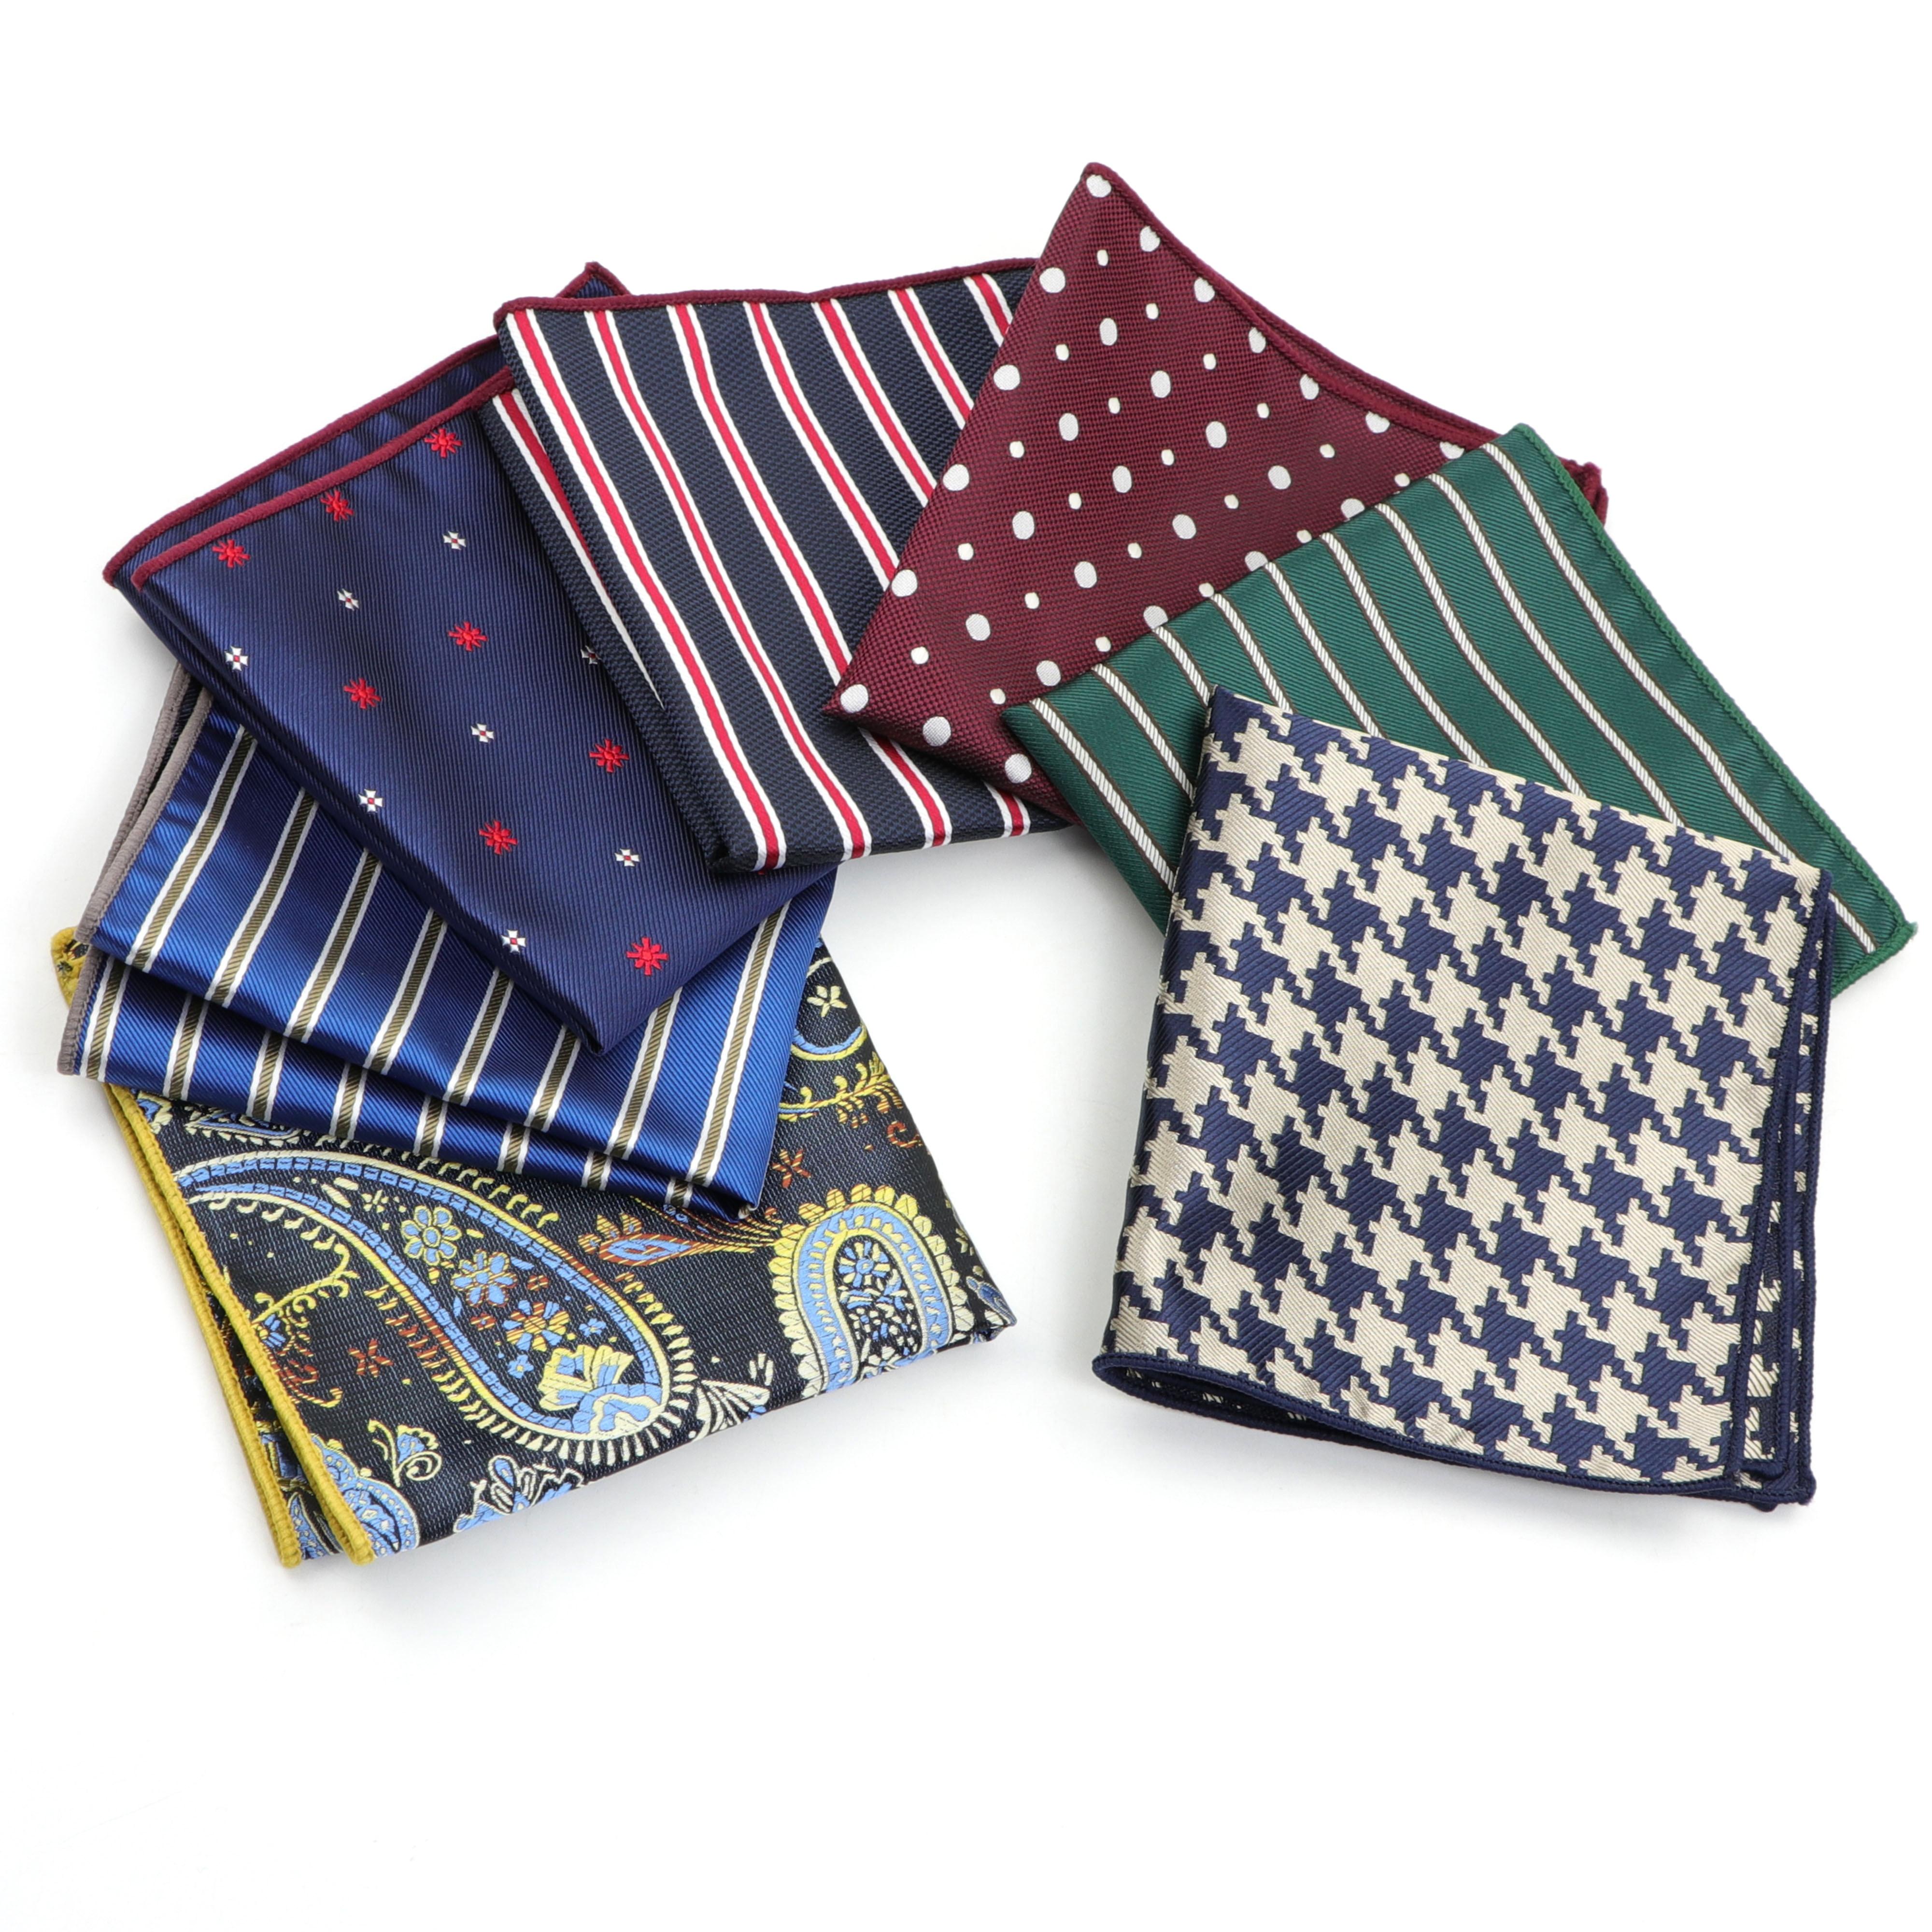 Men's Handkerchief Polka Dot Striped Woven Printing Pocket Square Hankies Business Casual Polyester Hanky NO.21-44